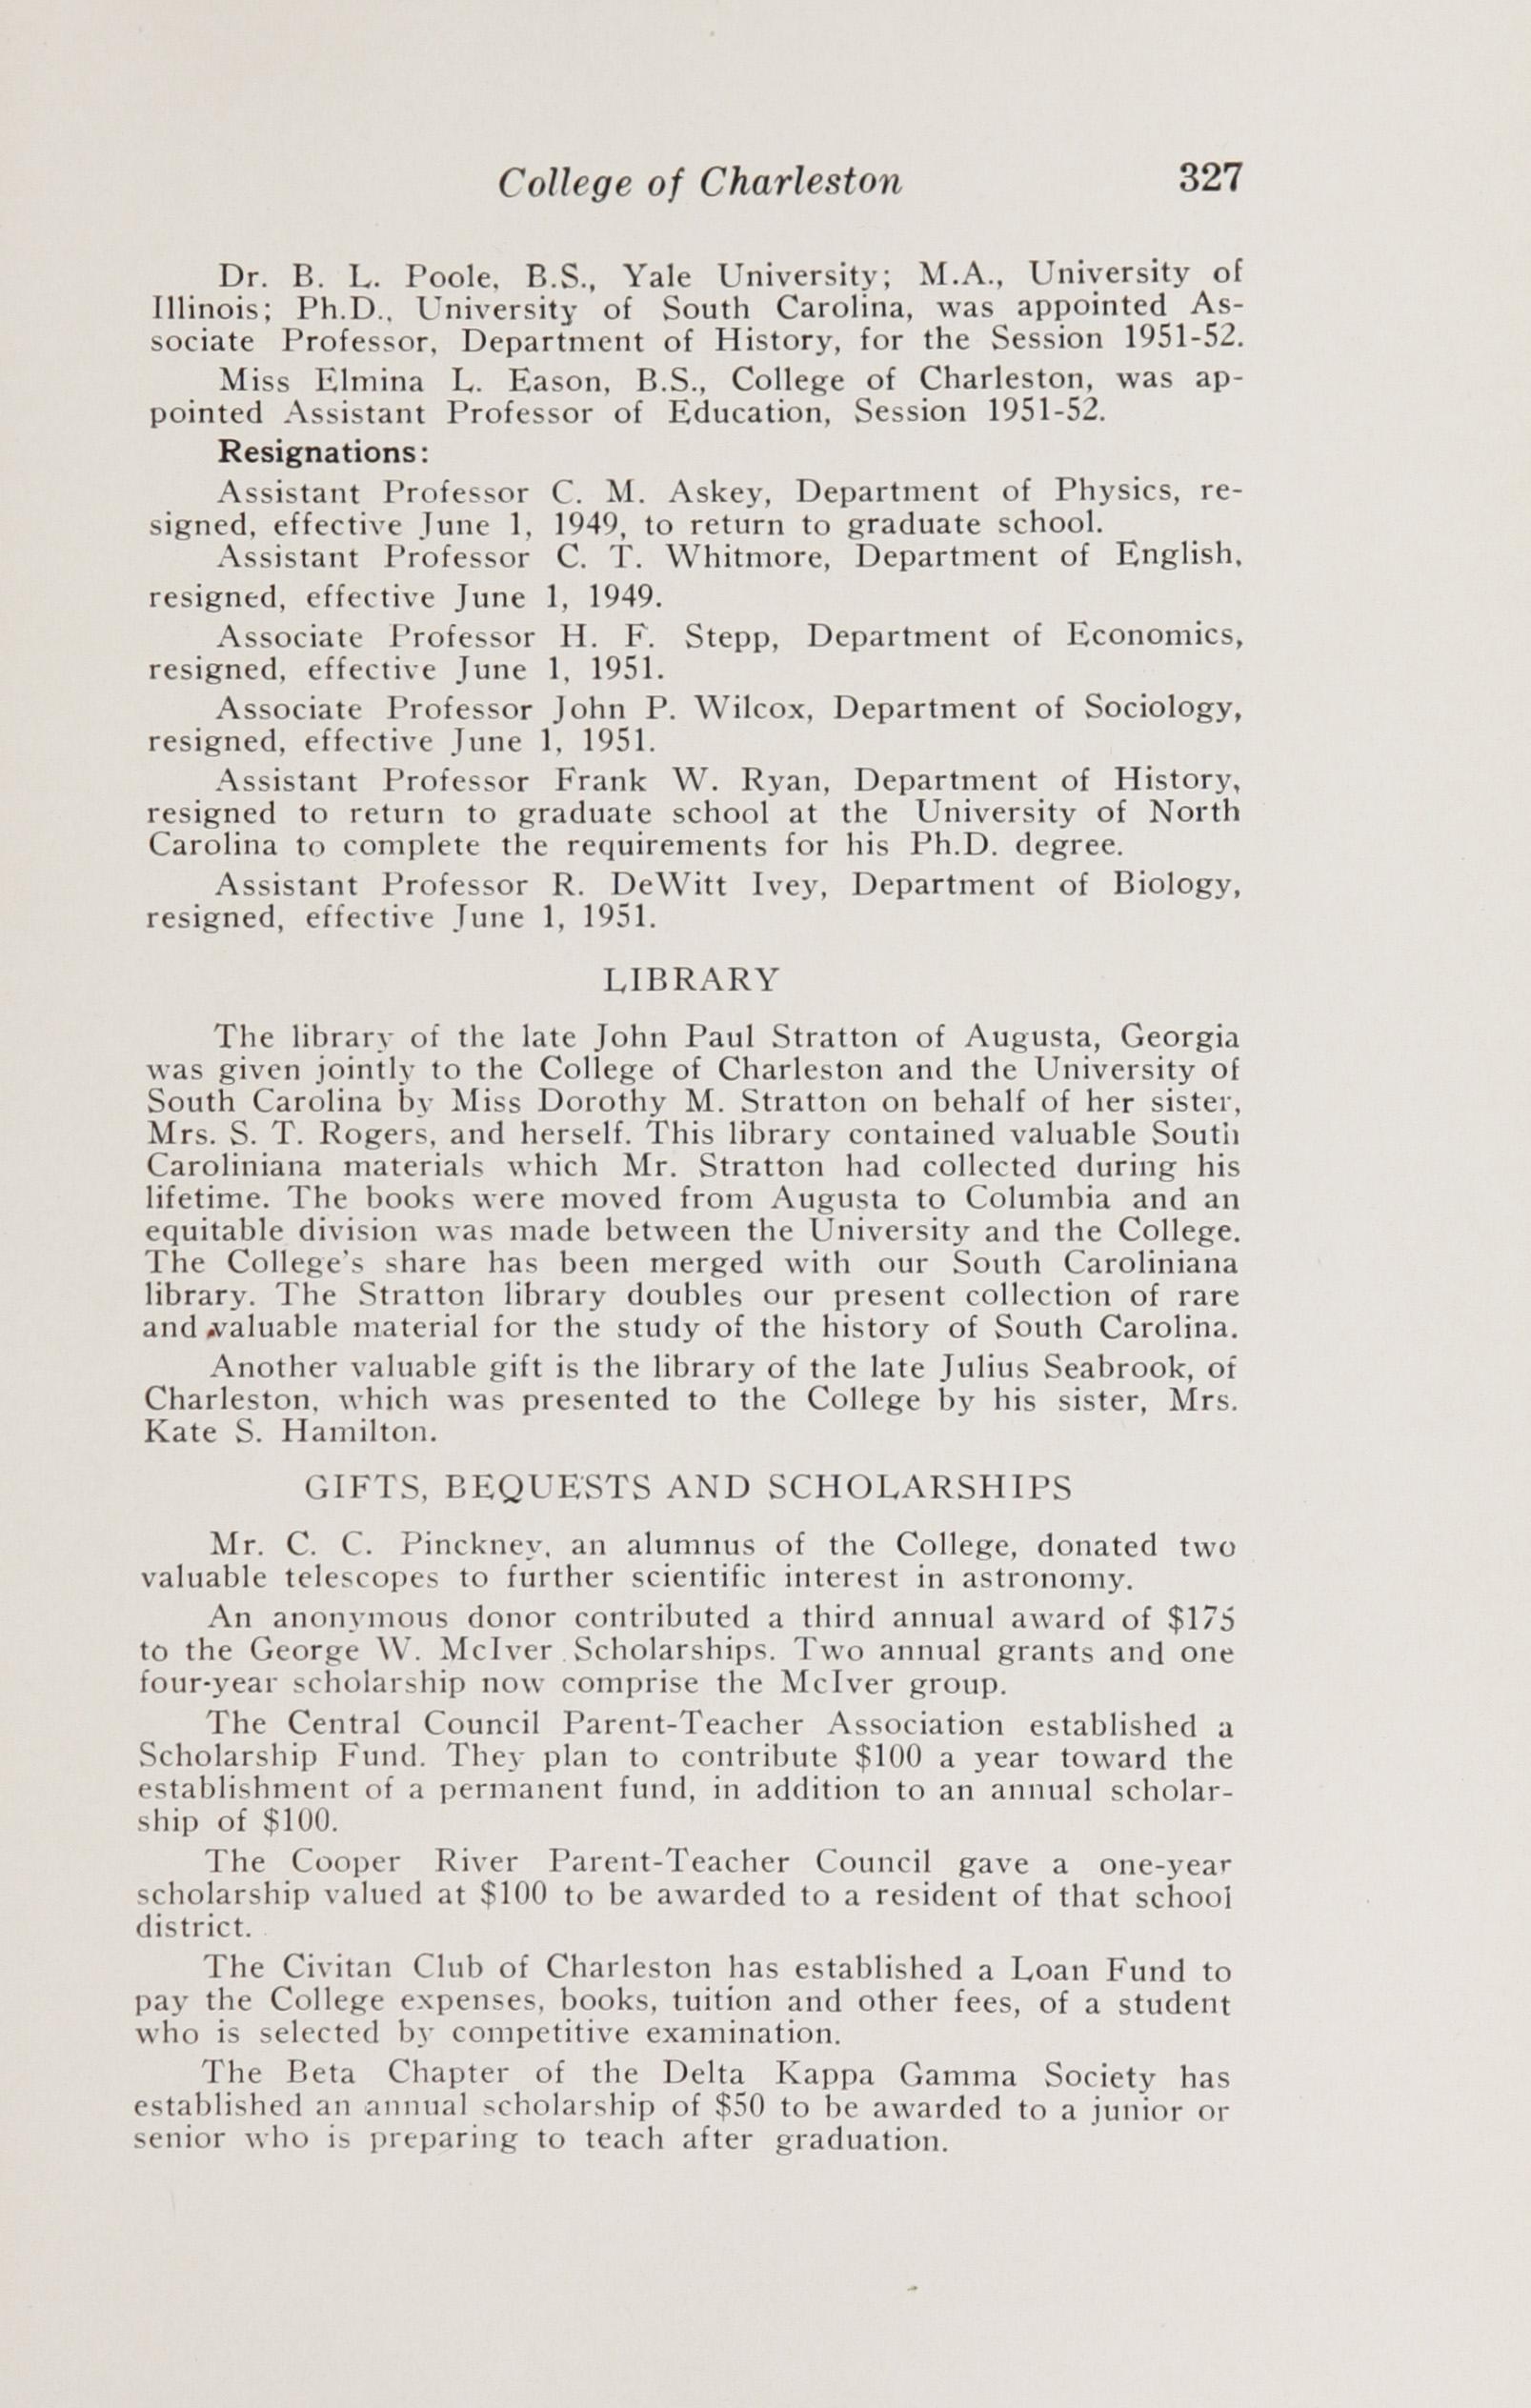 Charleston Yearbook, 1949-50-51, Page 327